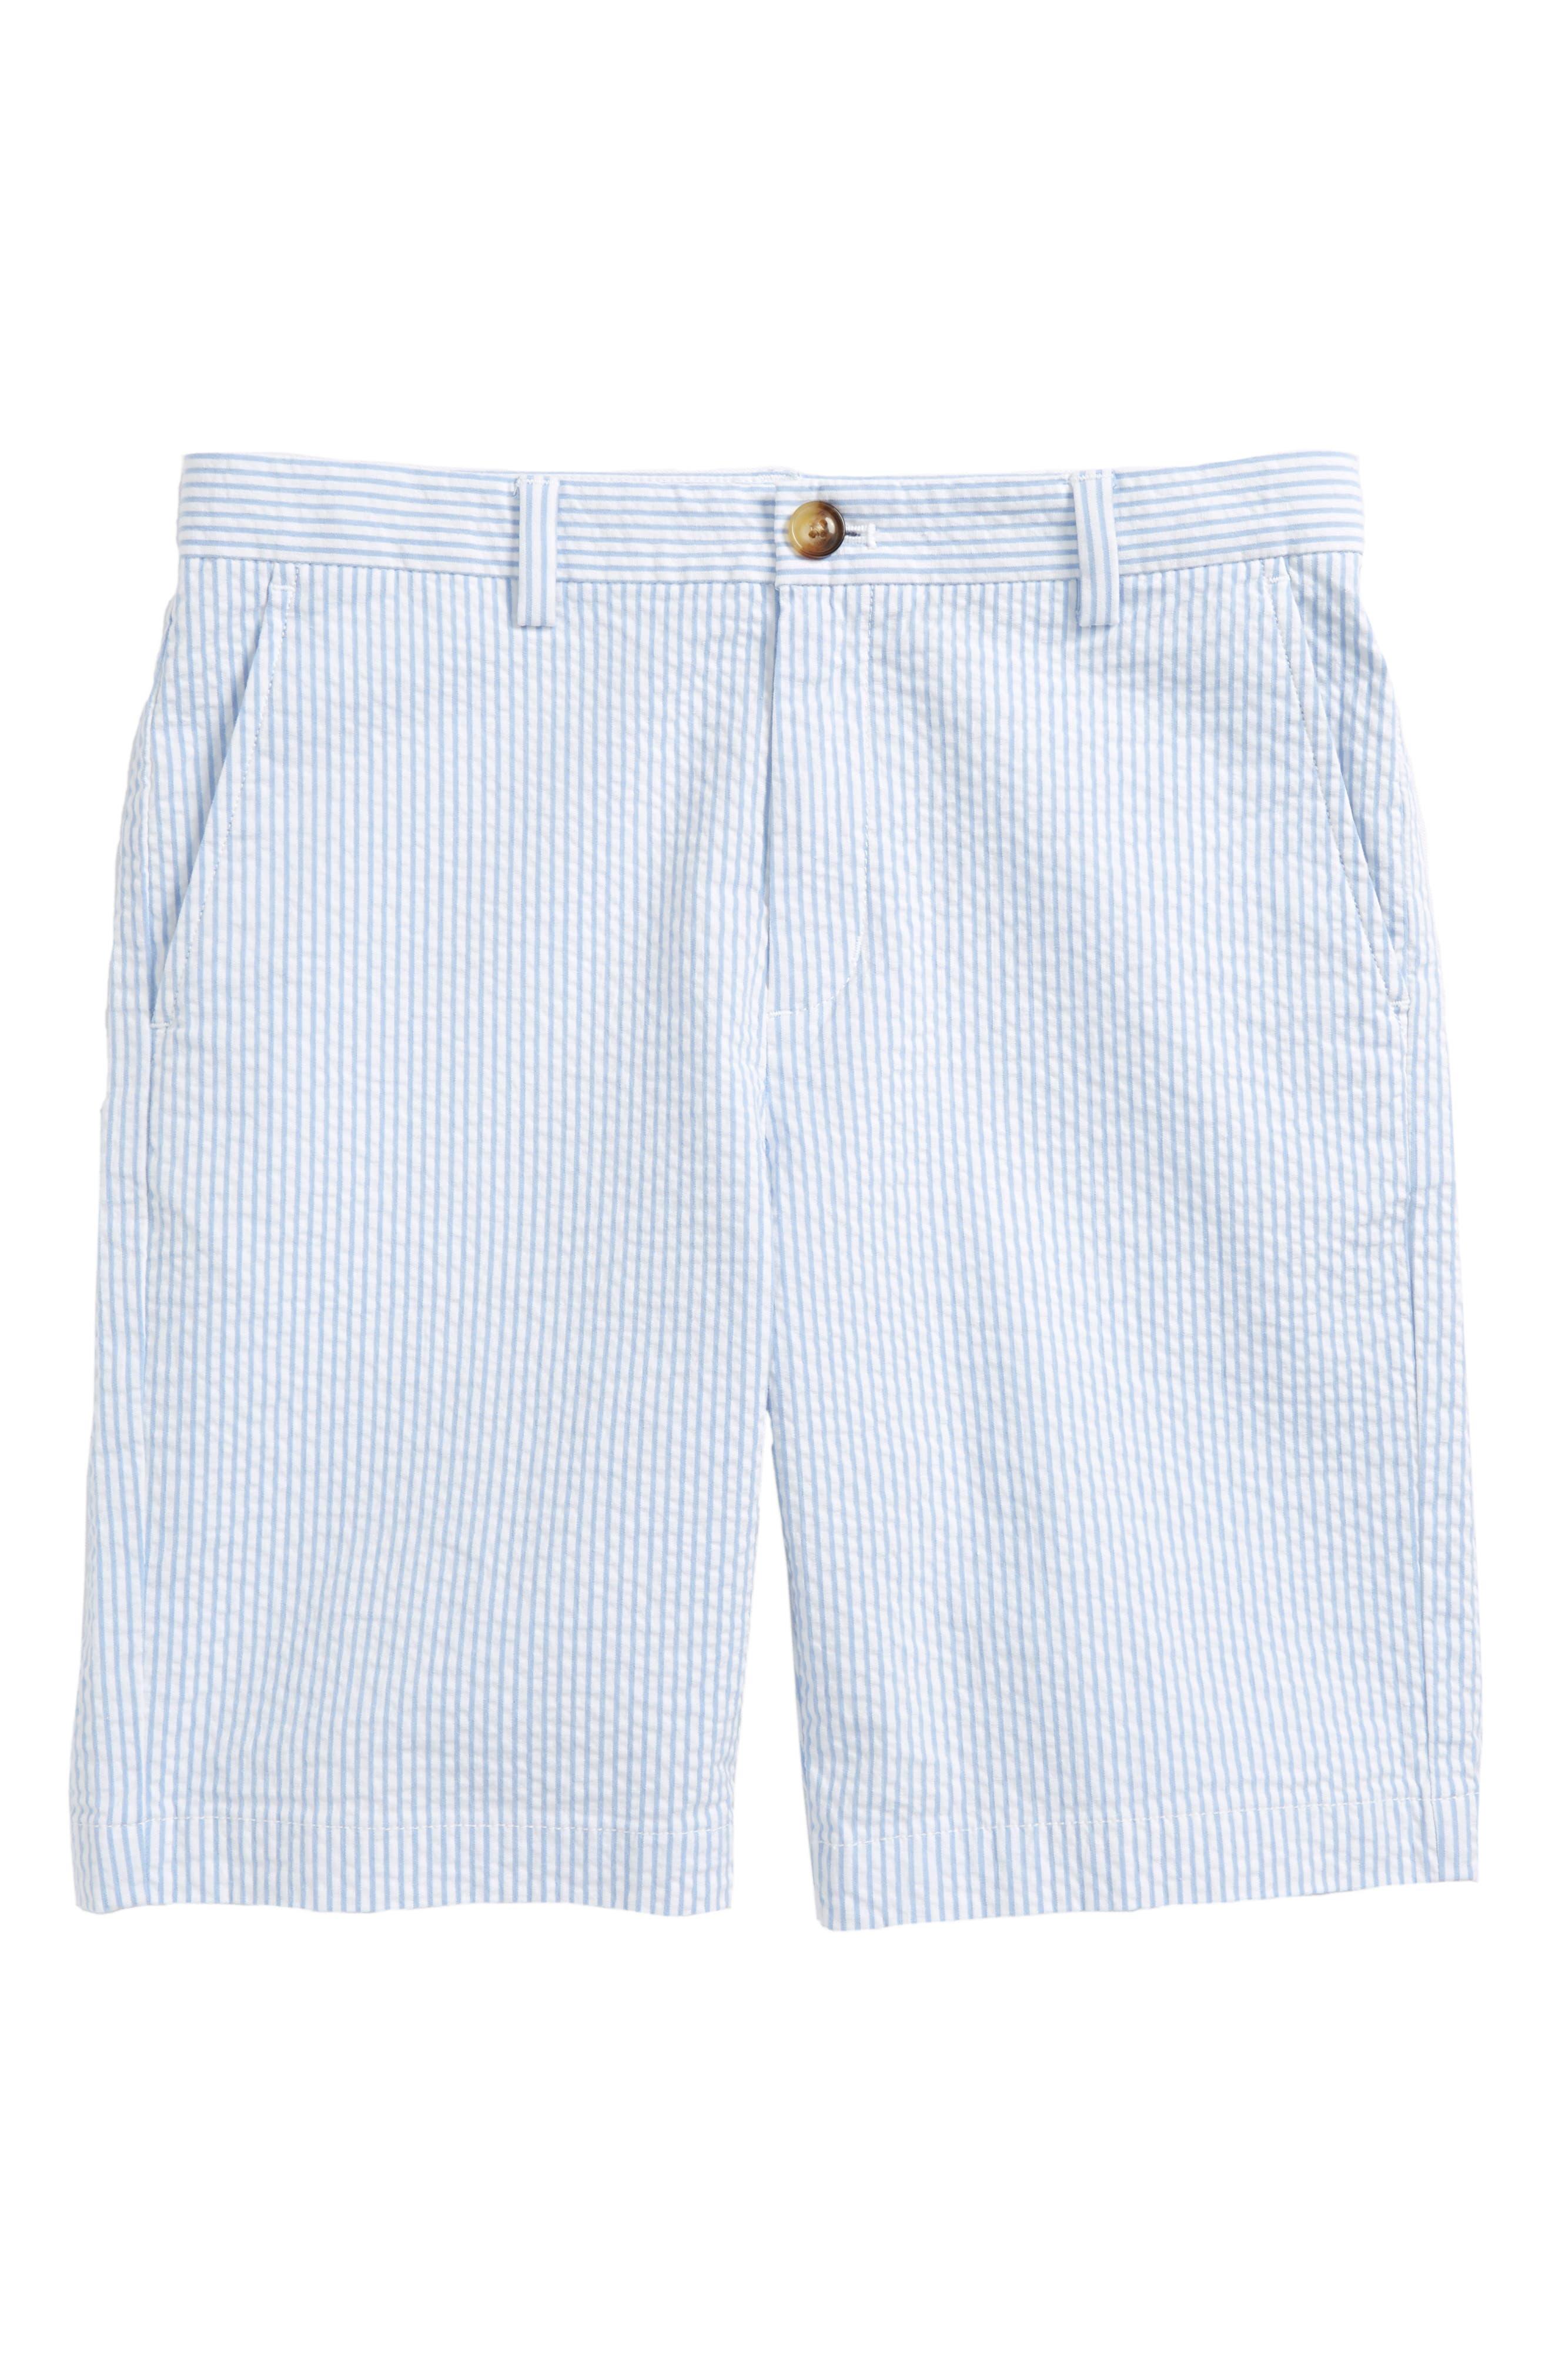 Seersucker Stripe Breaker Shorts,                         Main,                         color, Ocean Breeze